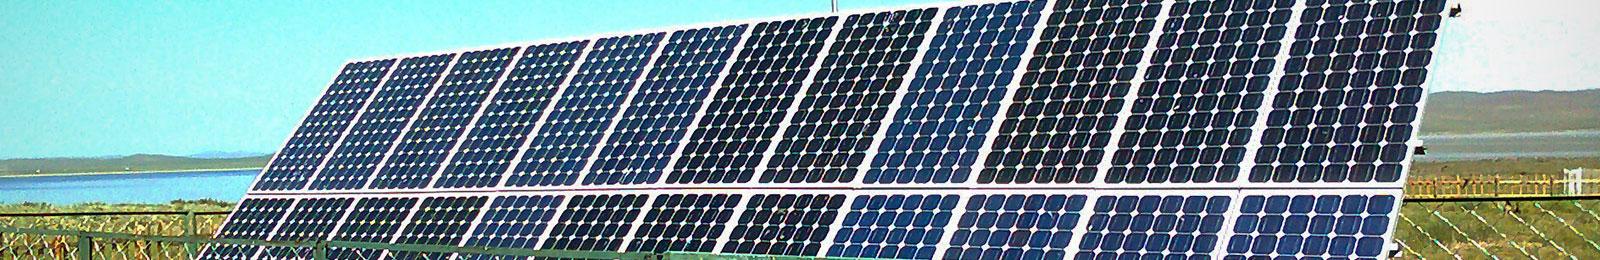 Solar Project Developmentpage banner image